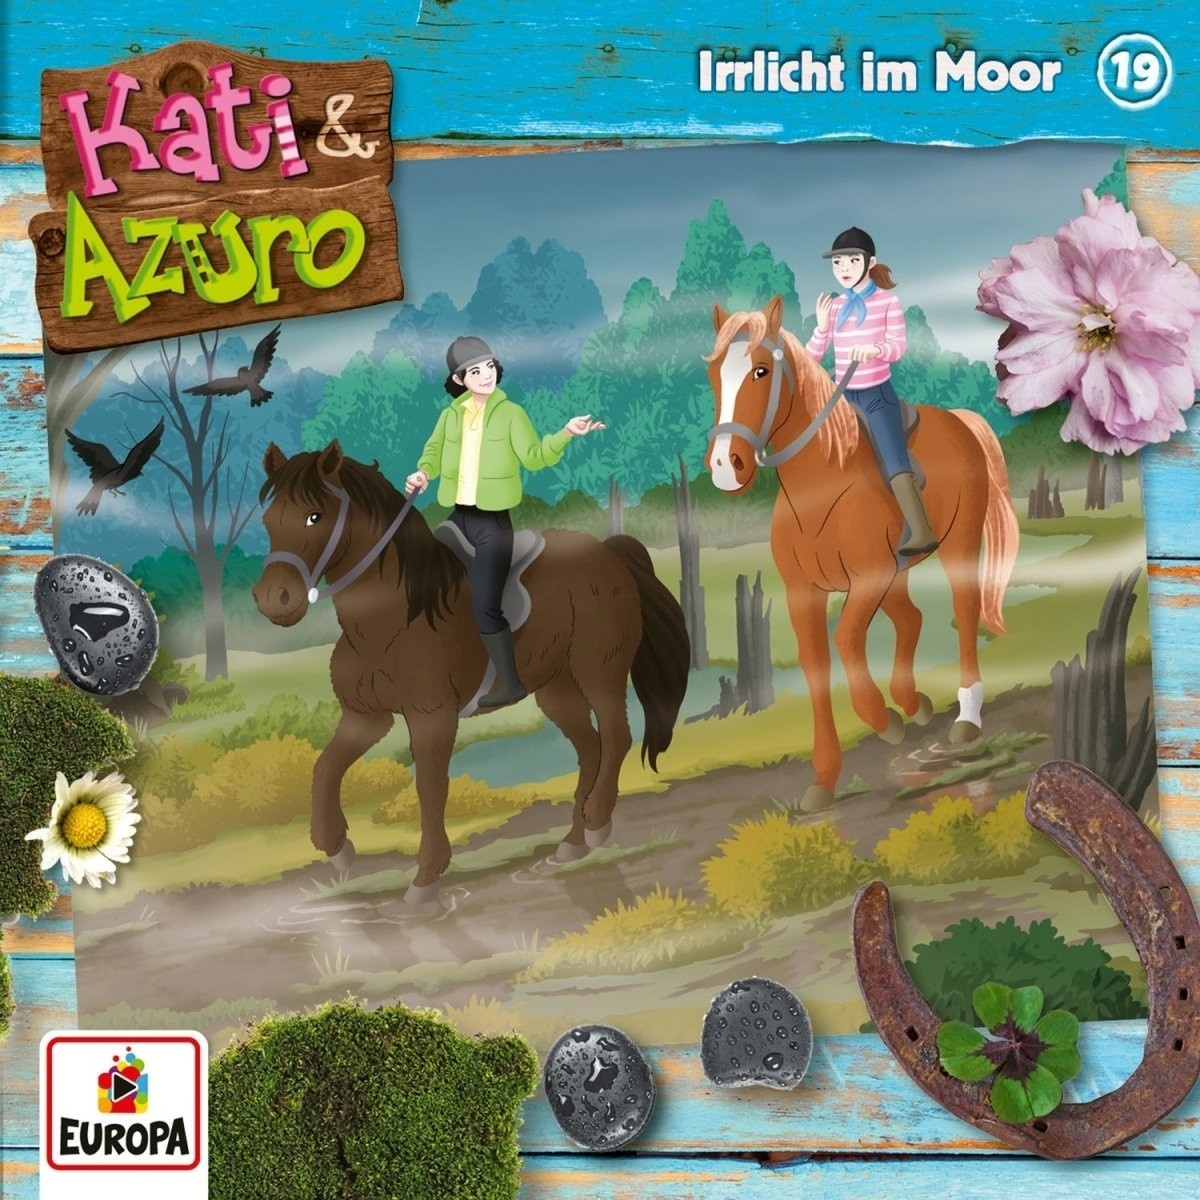 Kati & Azuro - Folge 19: Irrlicht im Moor